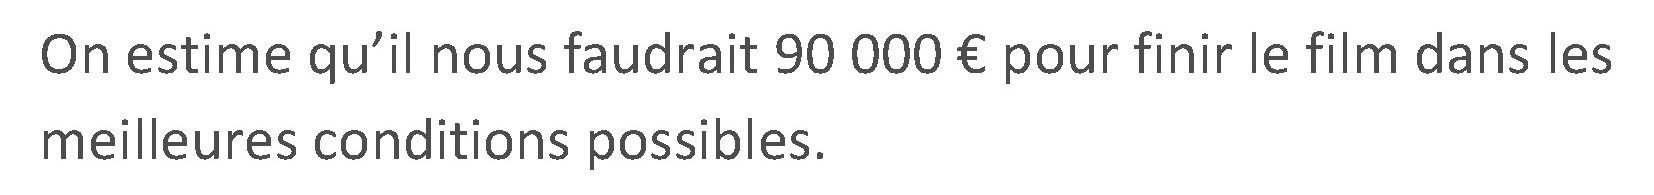 1-1529154456